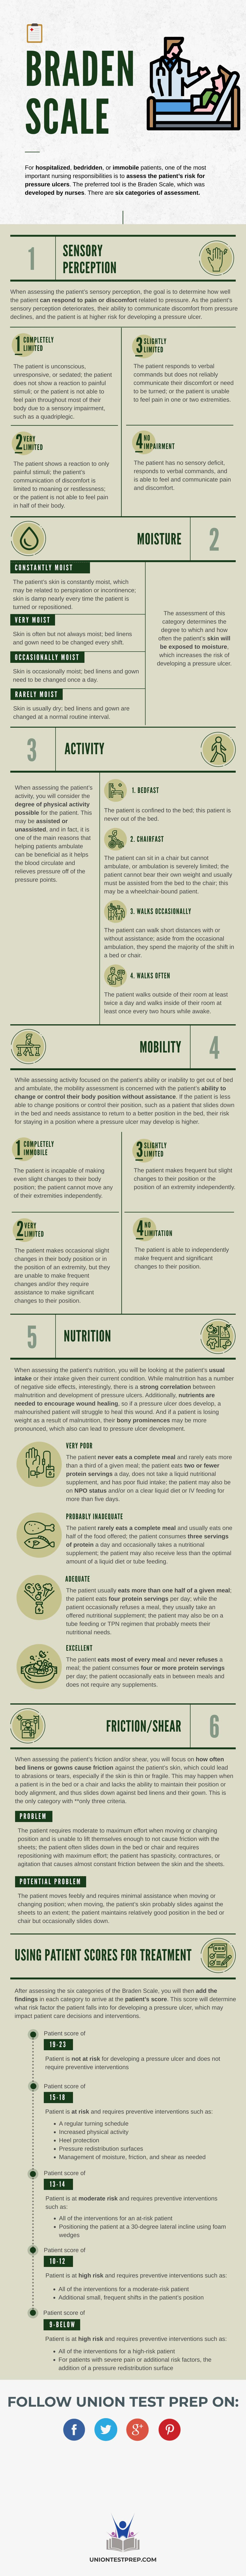 The Braden Scale